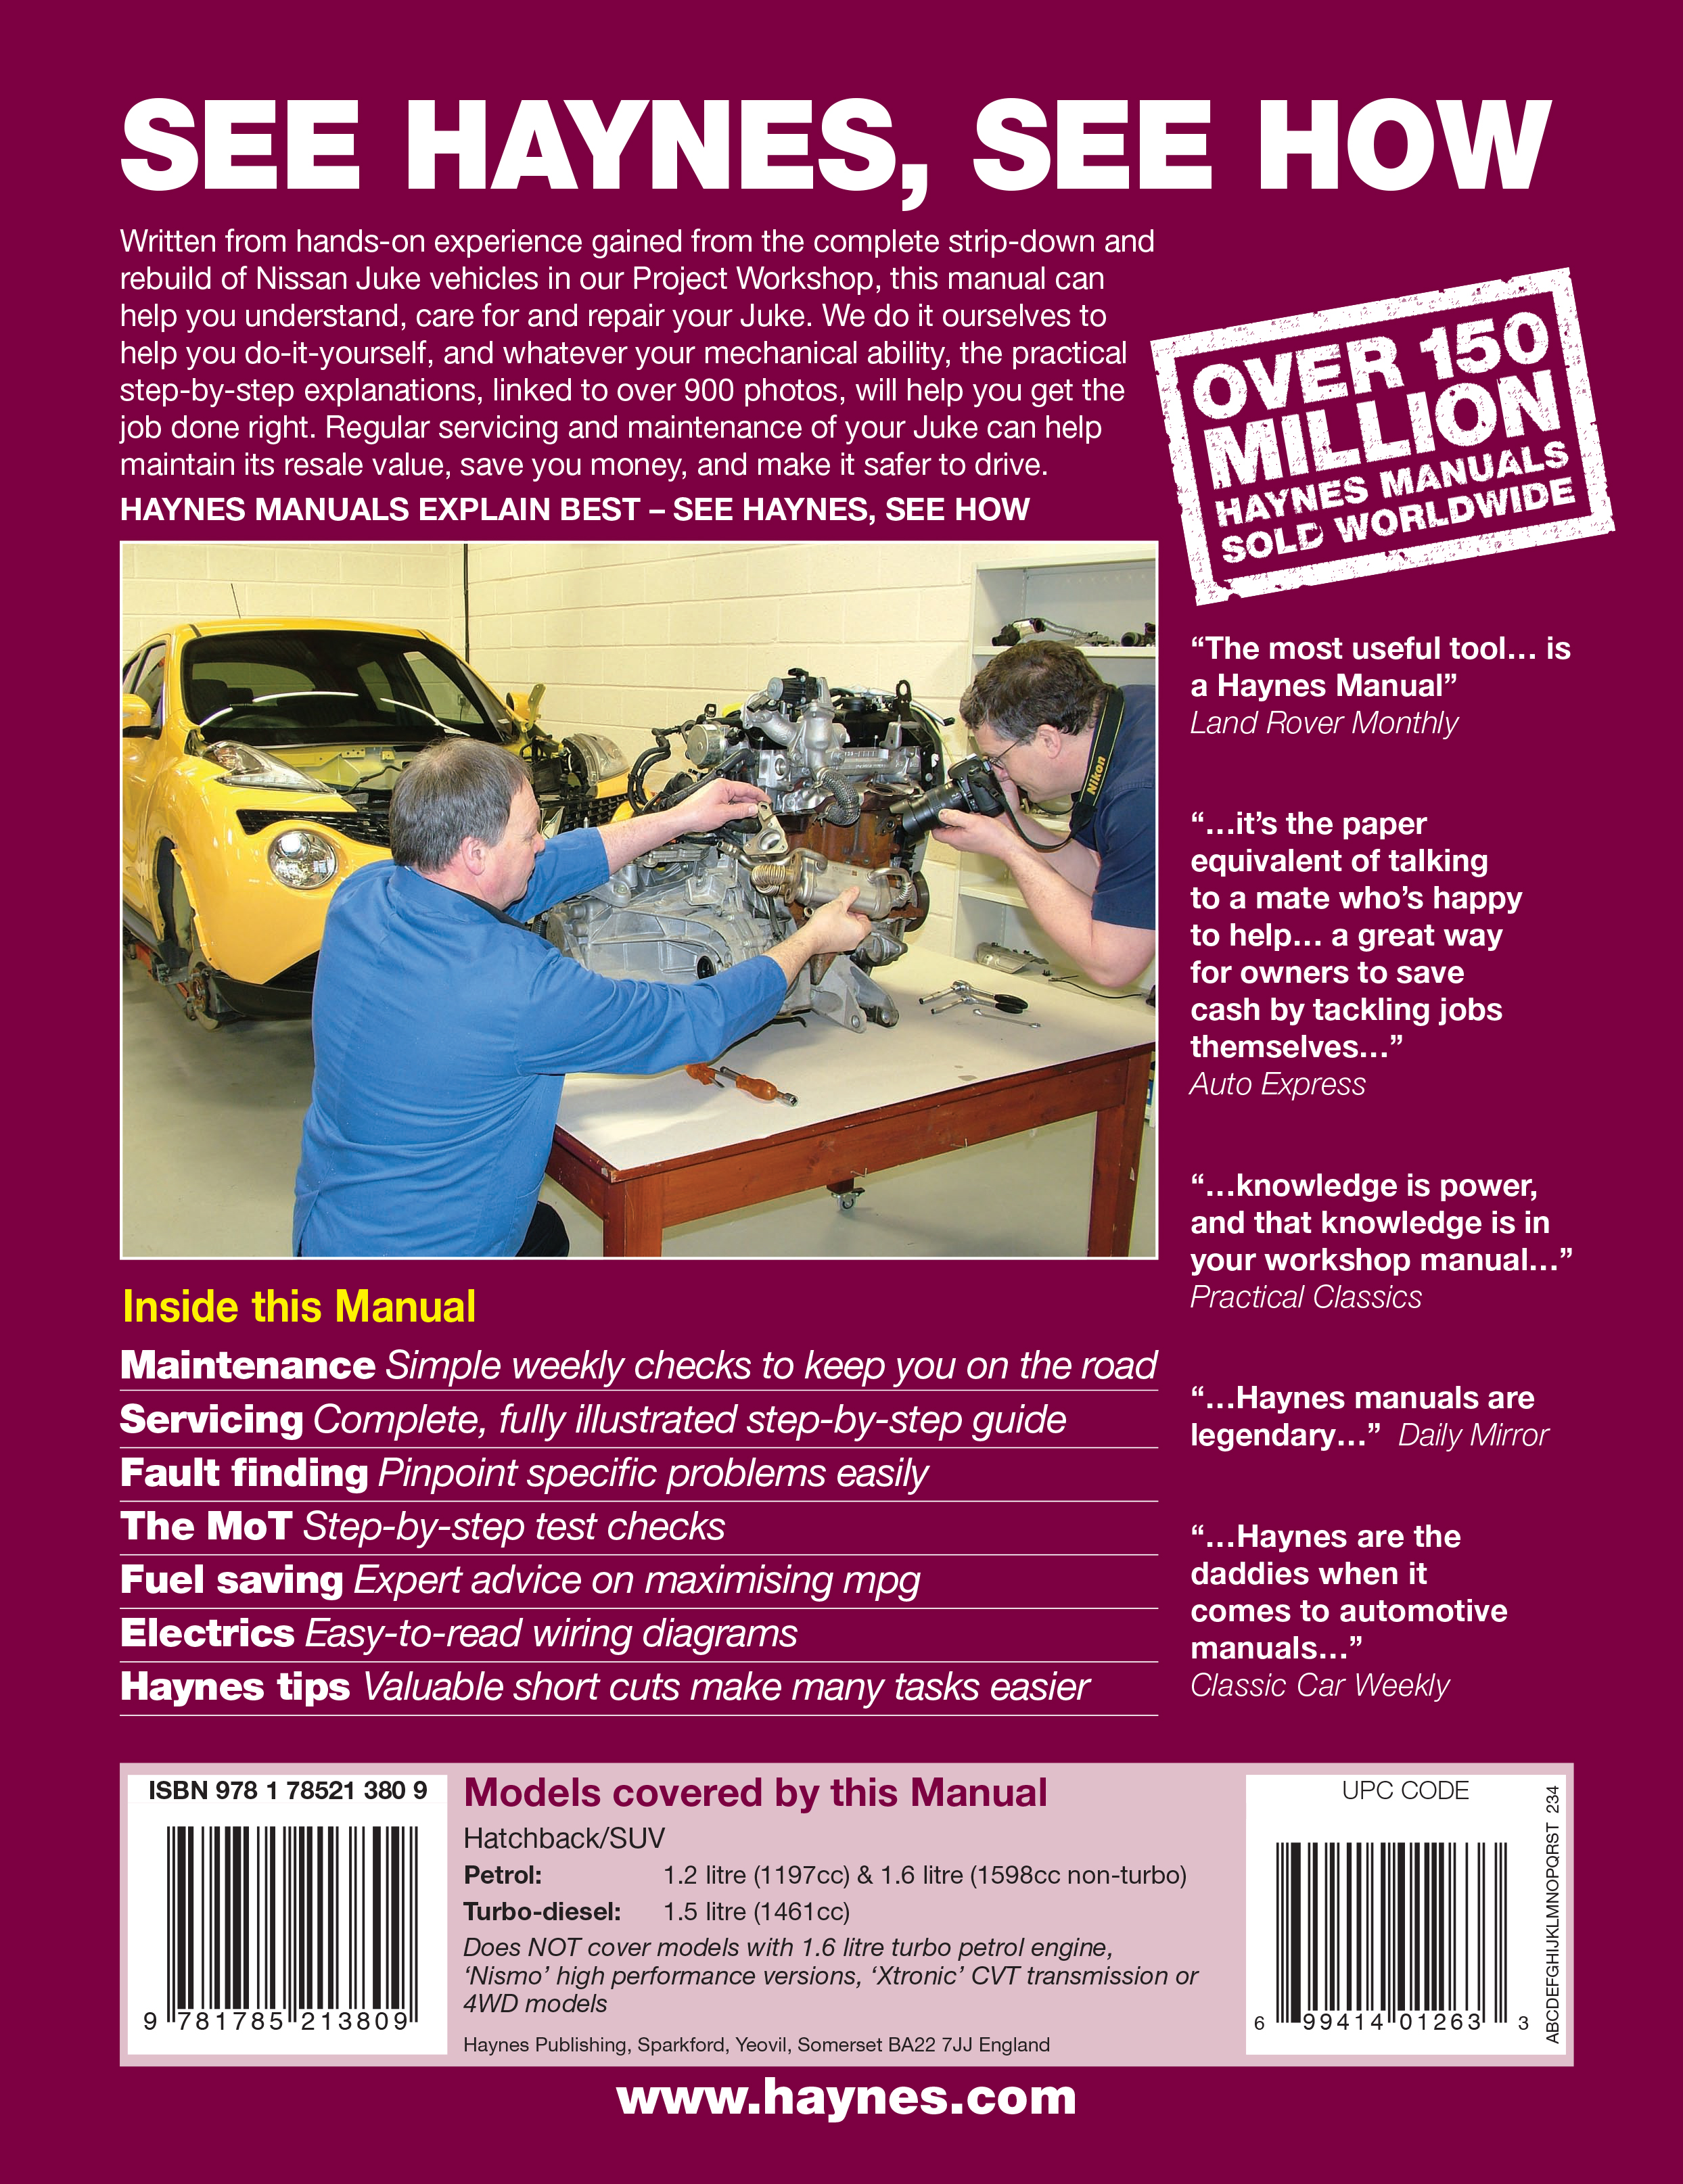 ... Array - juke haynes publishing rh haynes com scroll right Array -  nissan juke f15 2010 2014 workshop service repair manual ...